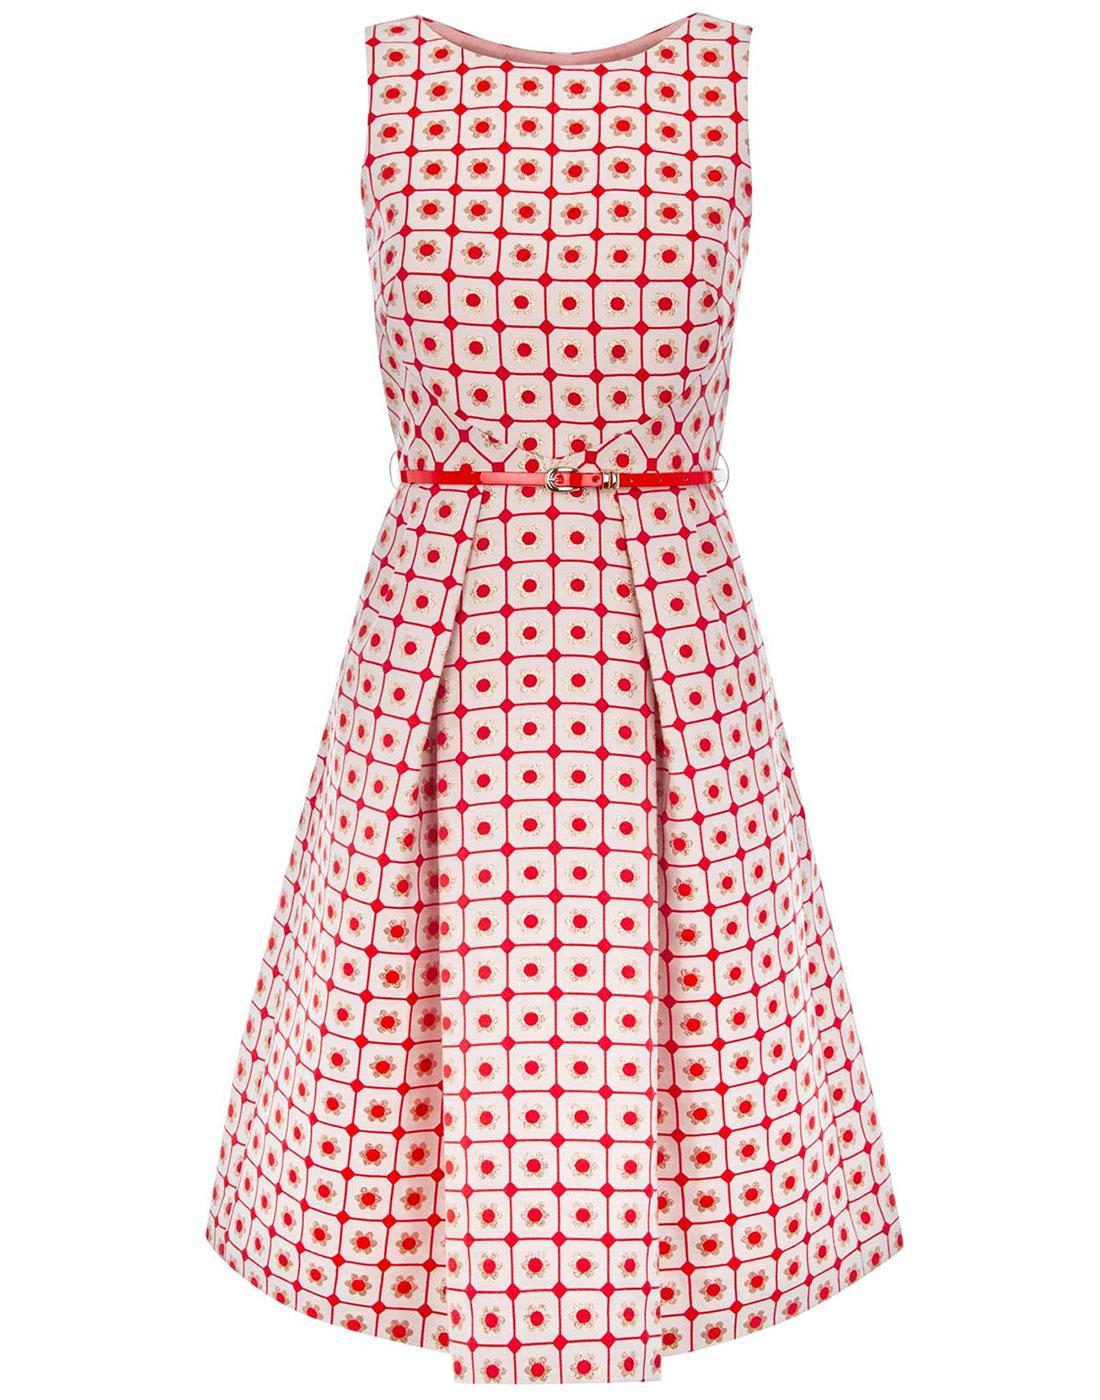 Doris TRAFFIC PEOPLE Retro 60s Pattern Geo Dress